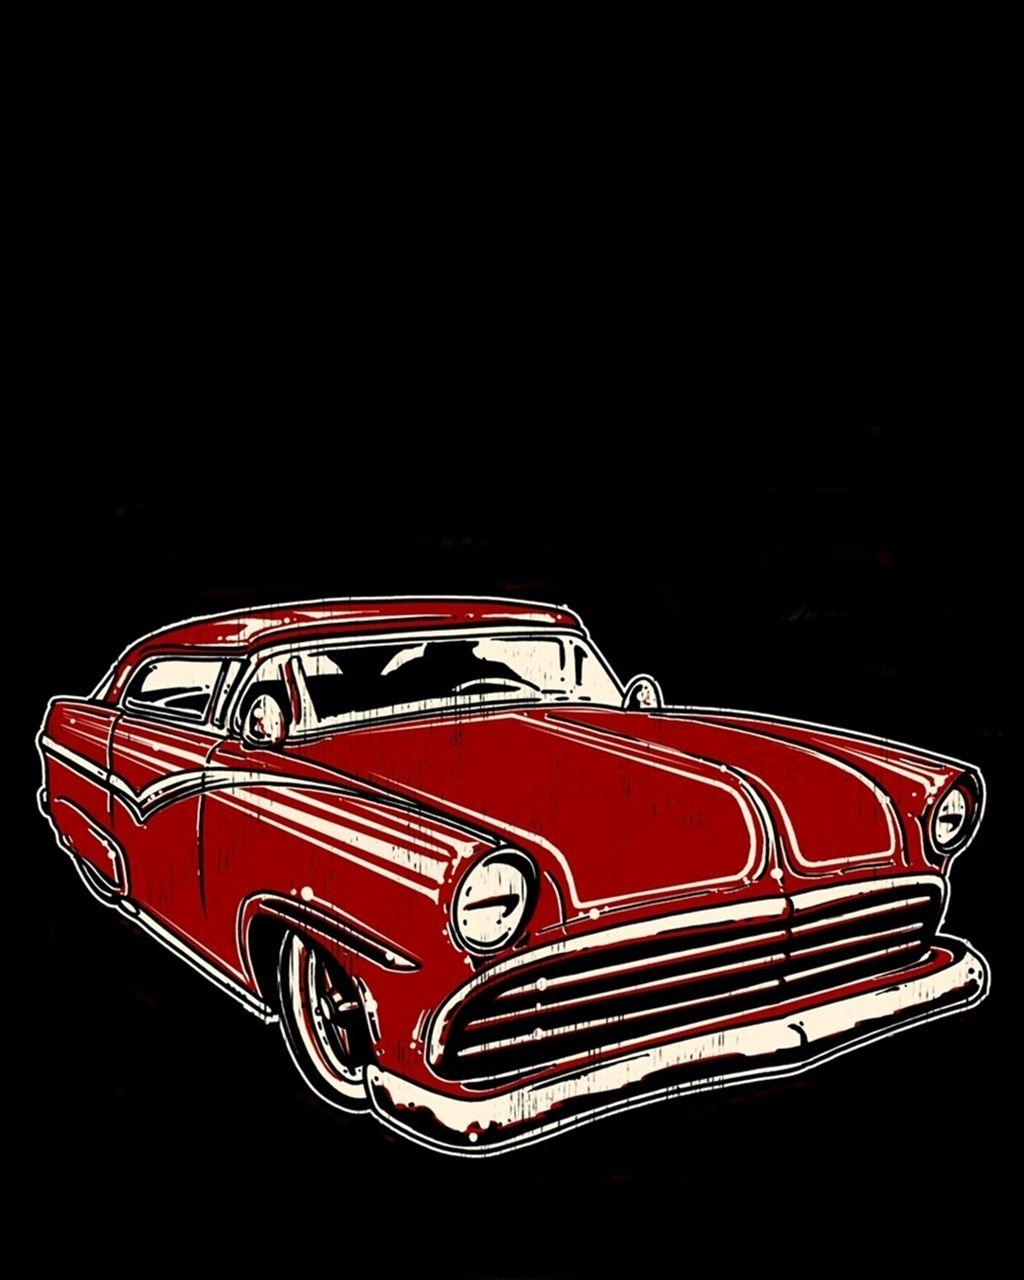 Santa Maria Chevrolet: Poster Art Hot Rod Rockabilly By Pave65 On DeviantArt